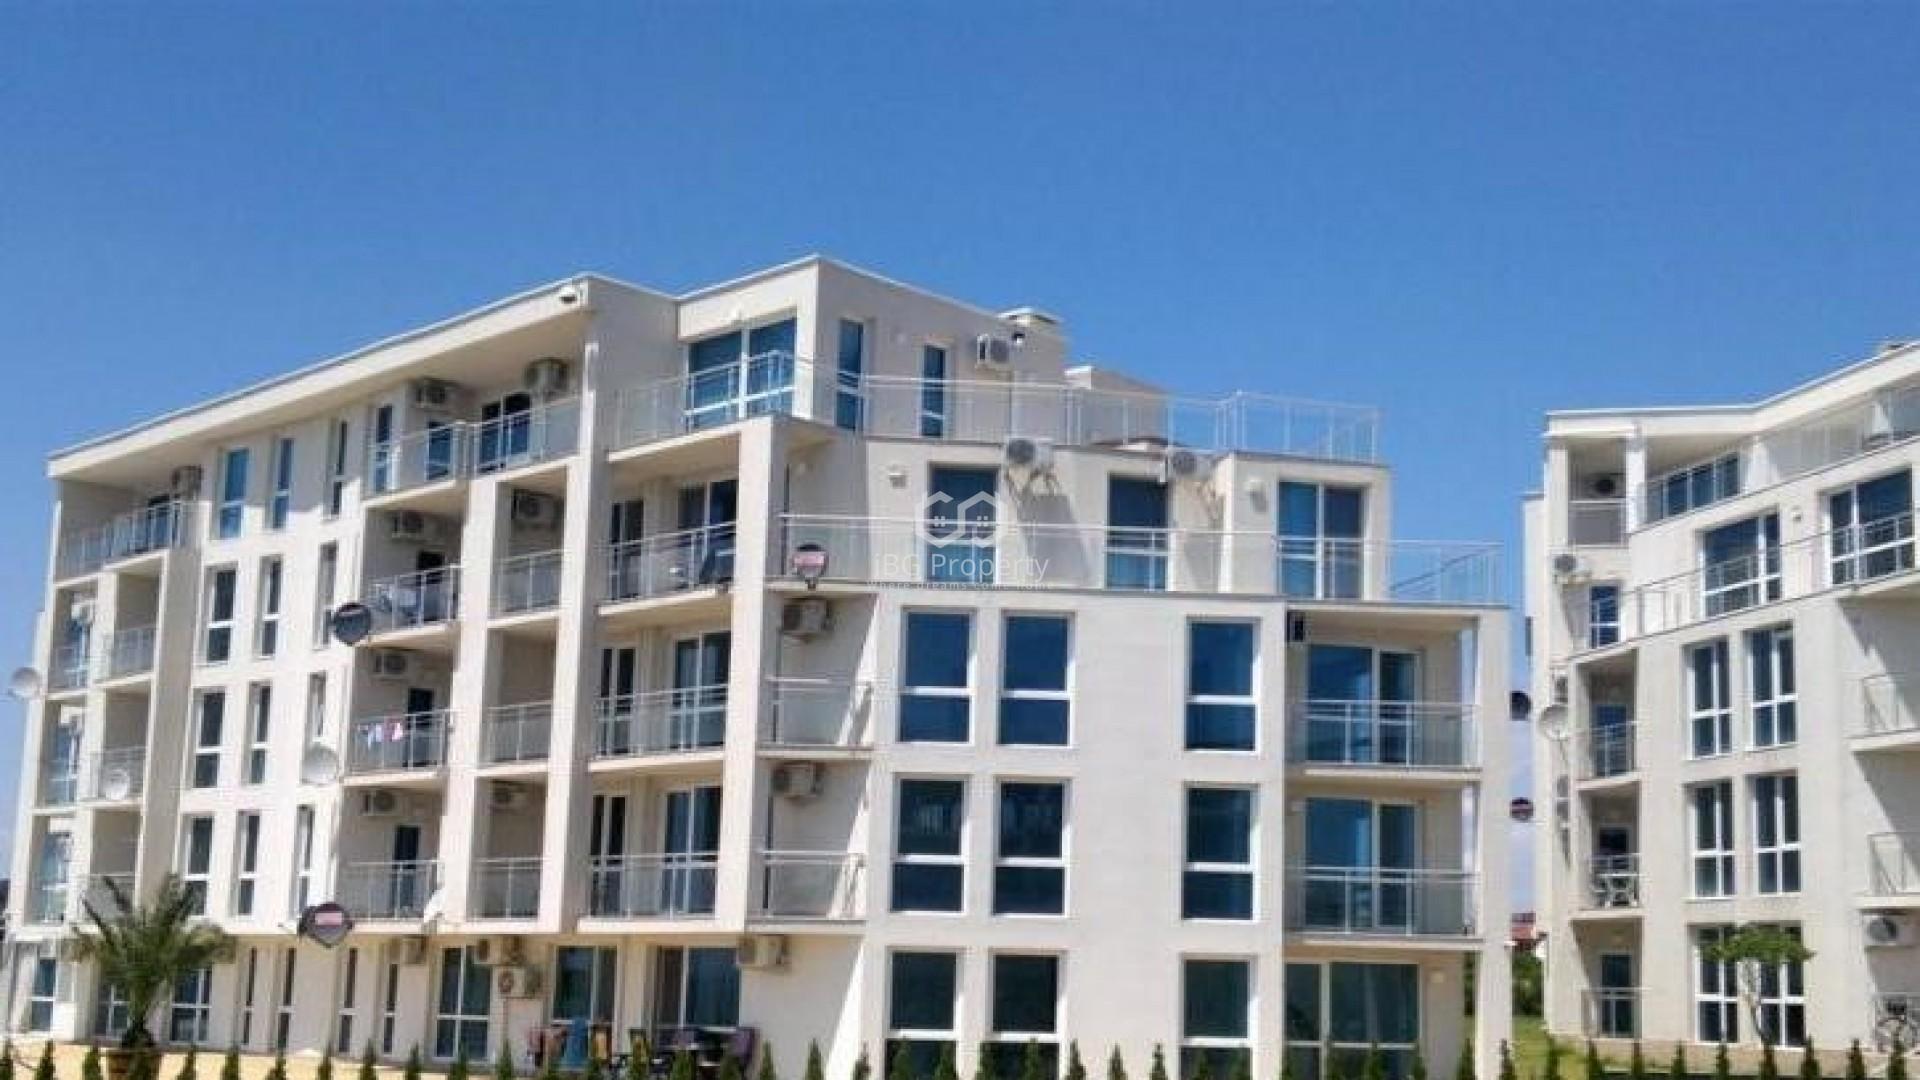 Двухкомнатная квартира Сарафово Бургас  59,42 m2